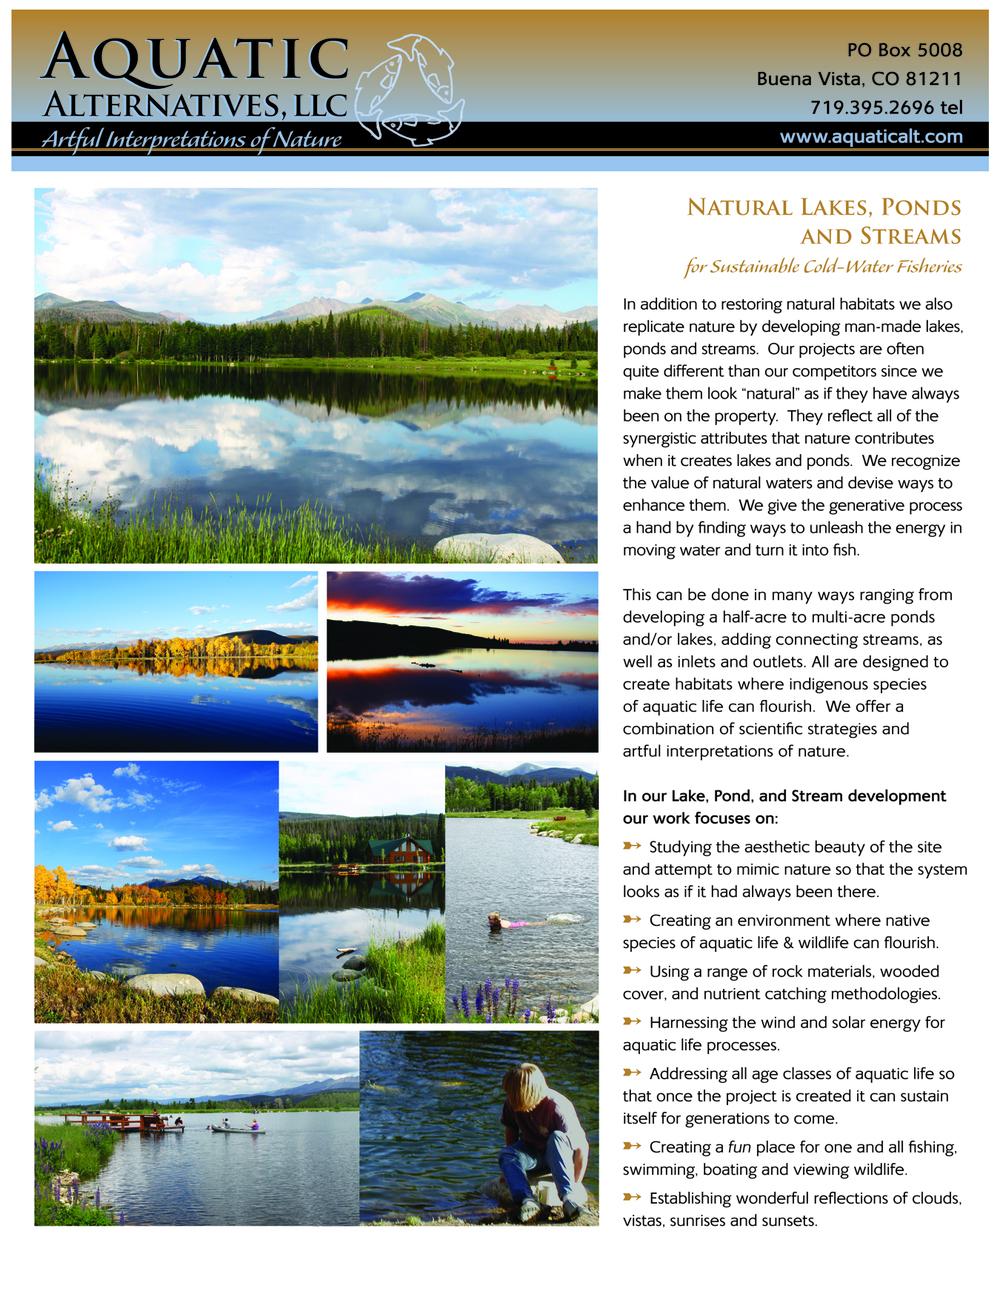 AA-Nat-Lake-Pond1.jpg